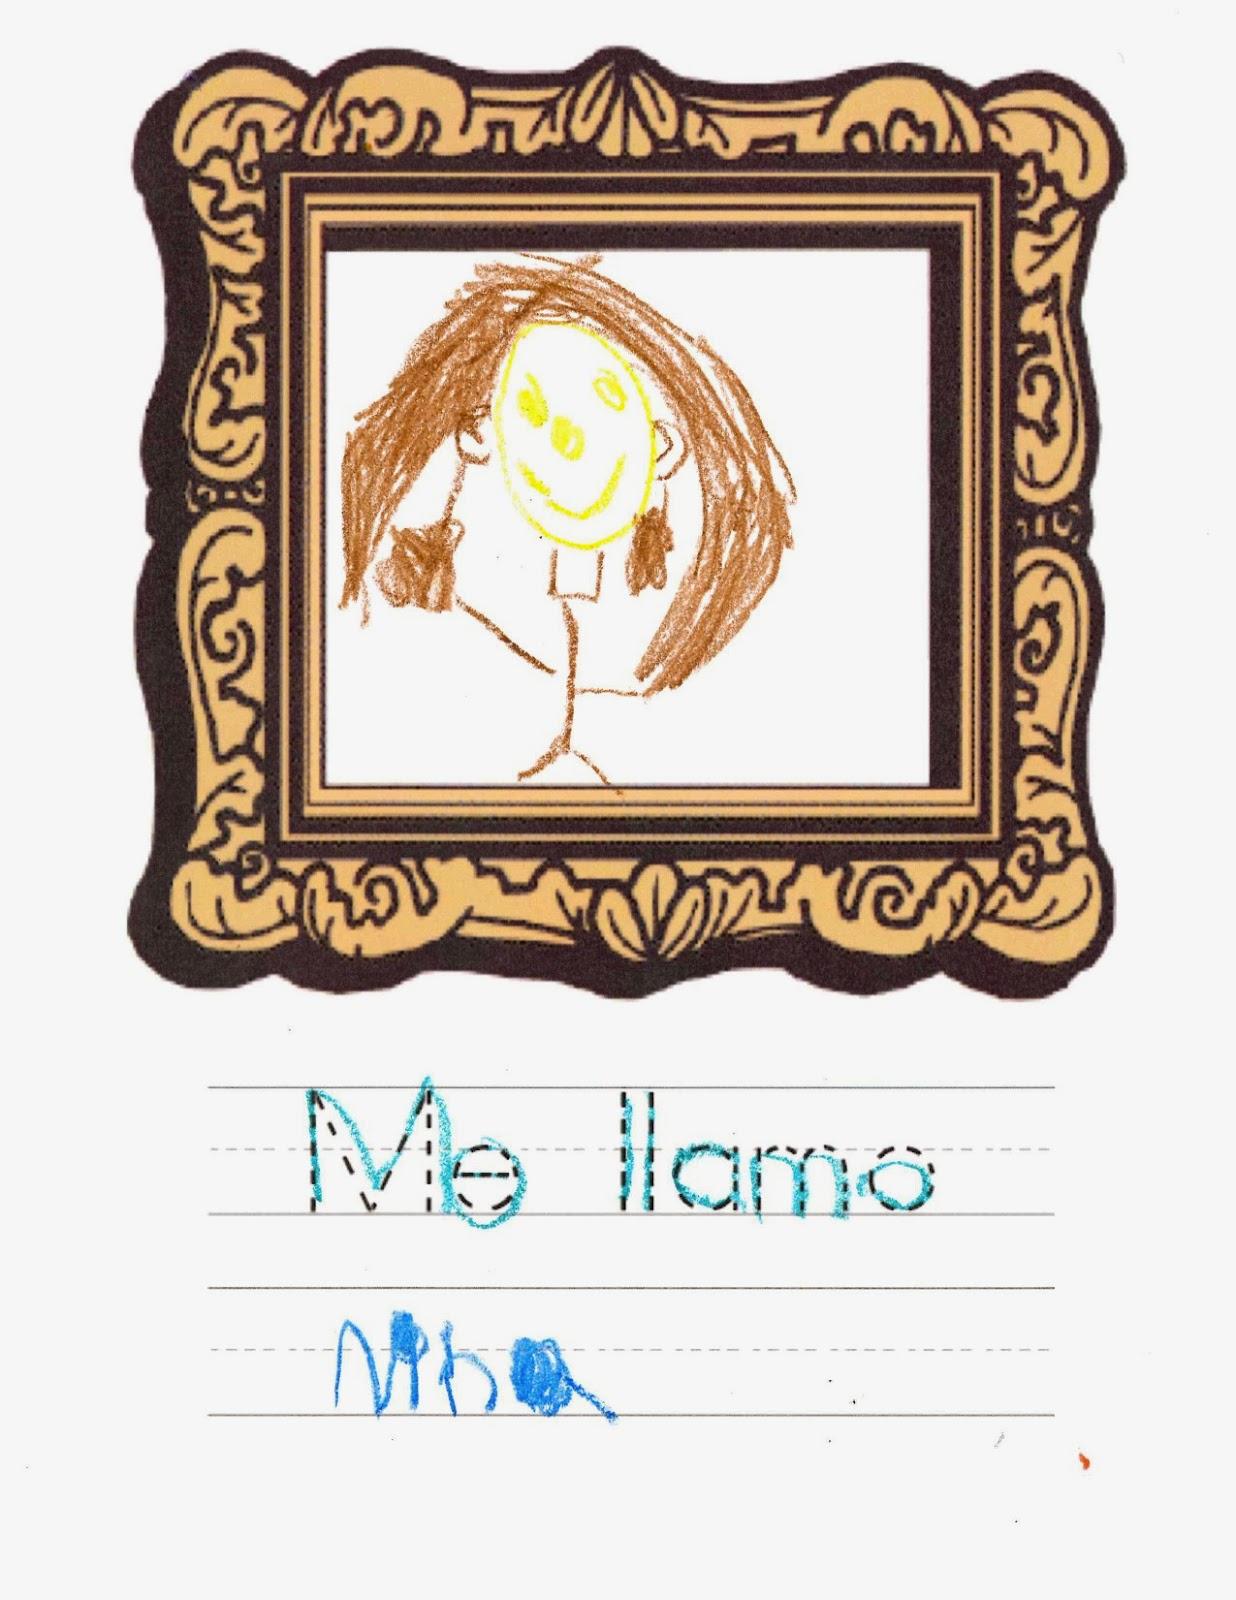 My Name Is Me Llamo Lesson